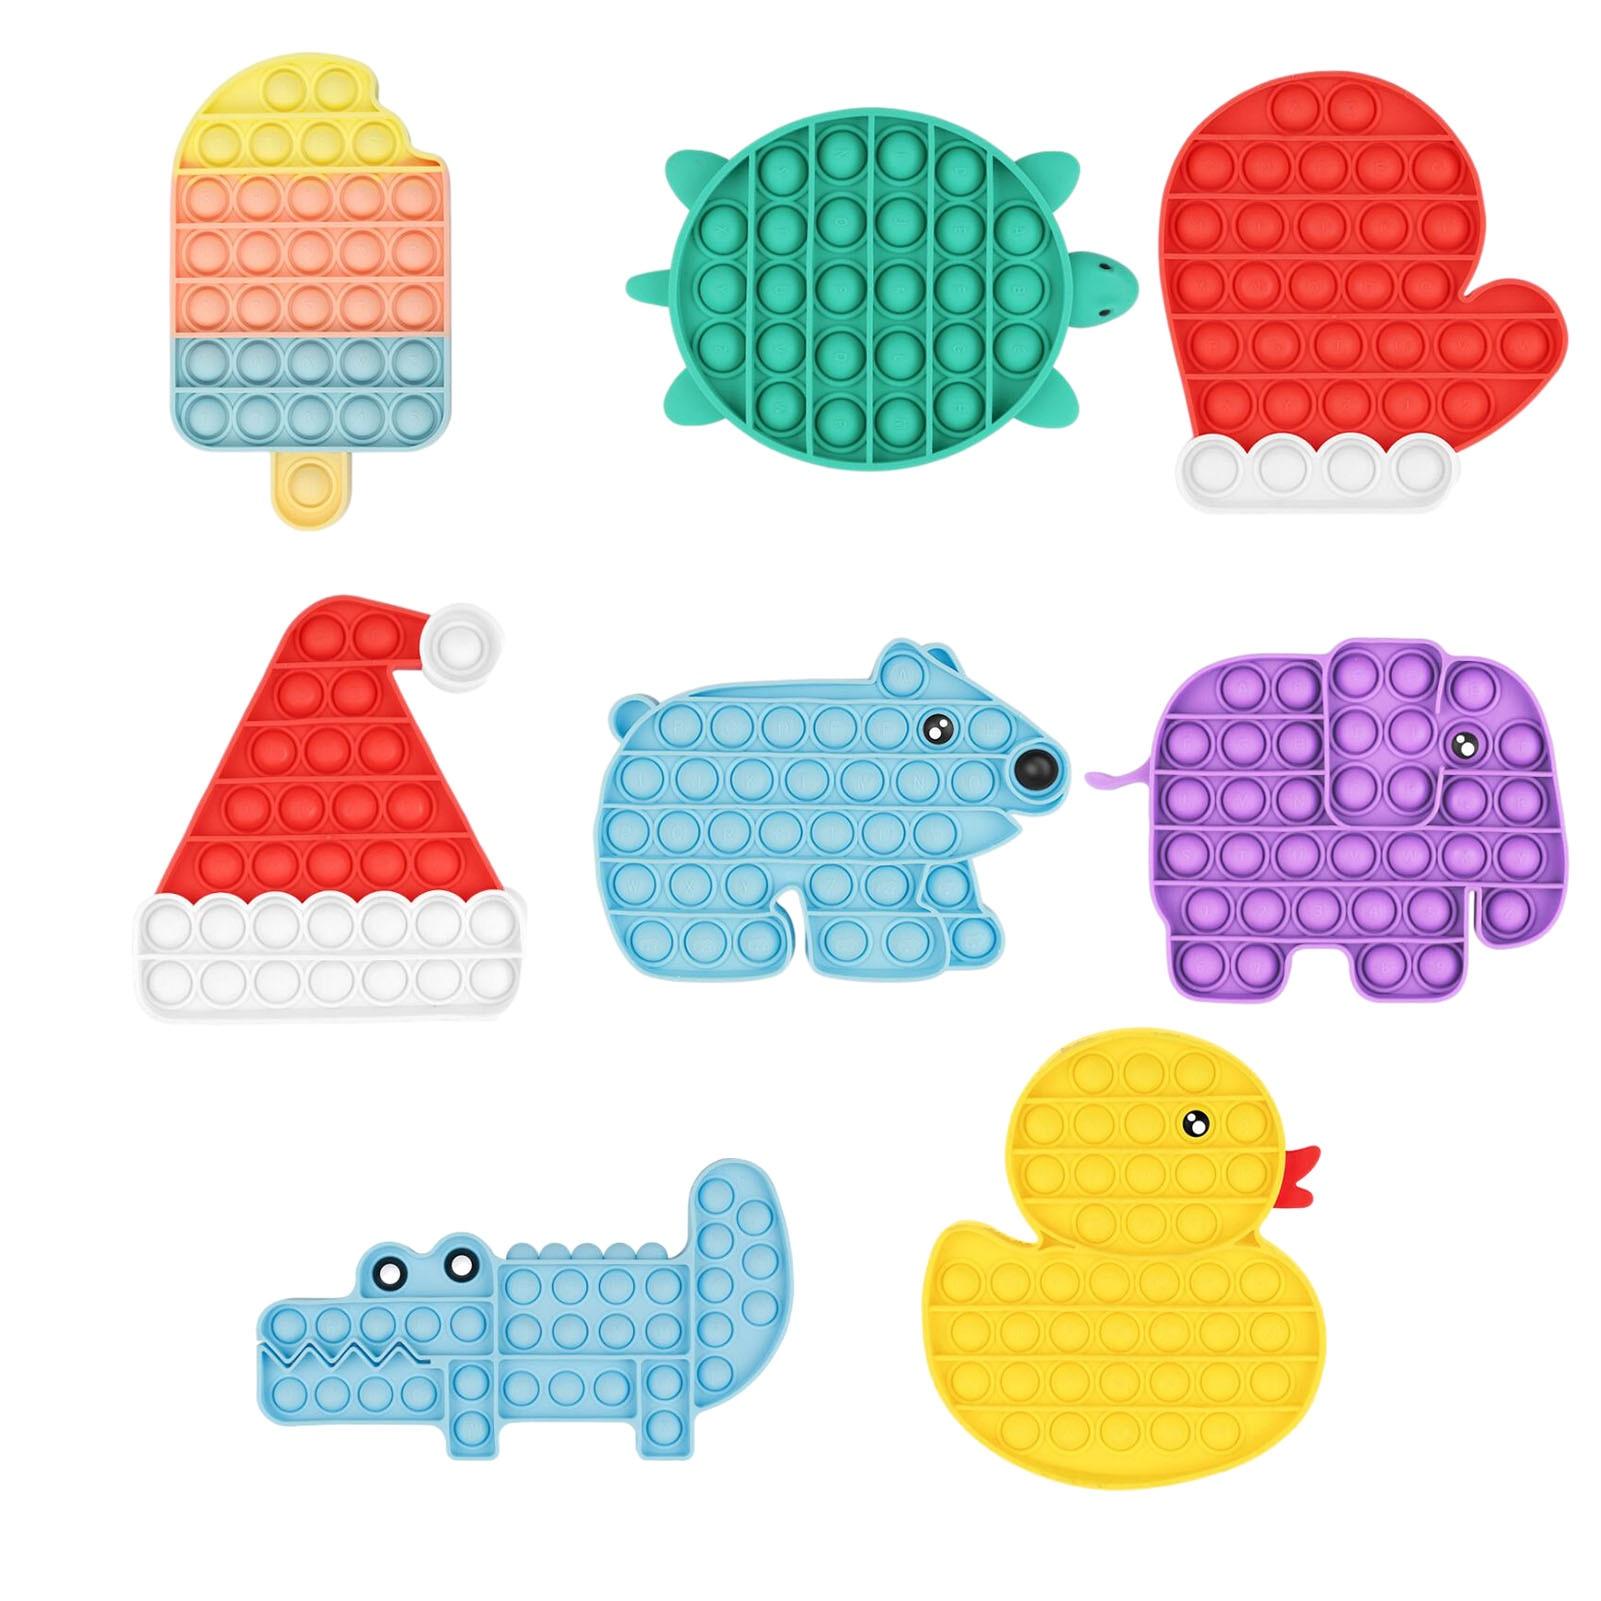 Popit Fidget Toys Sensory Decompression Toy Set Stress Relief Toys Autism Anxiety Squeeze Pop Bubble Fidget Toys For Kids Adults enlarge